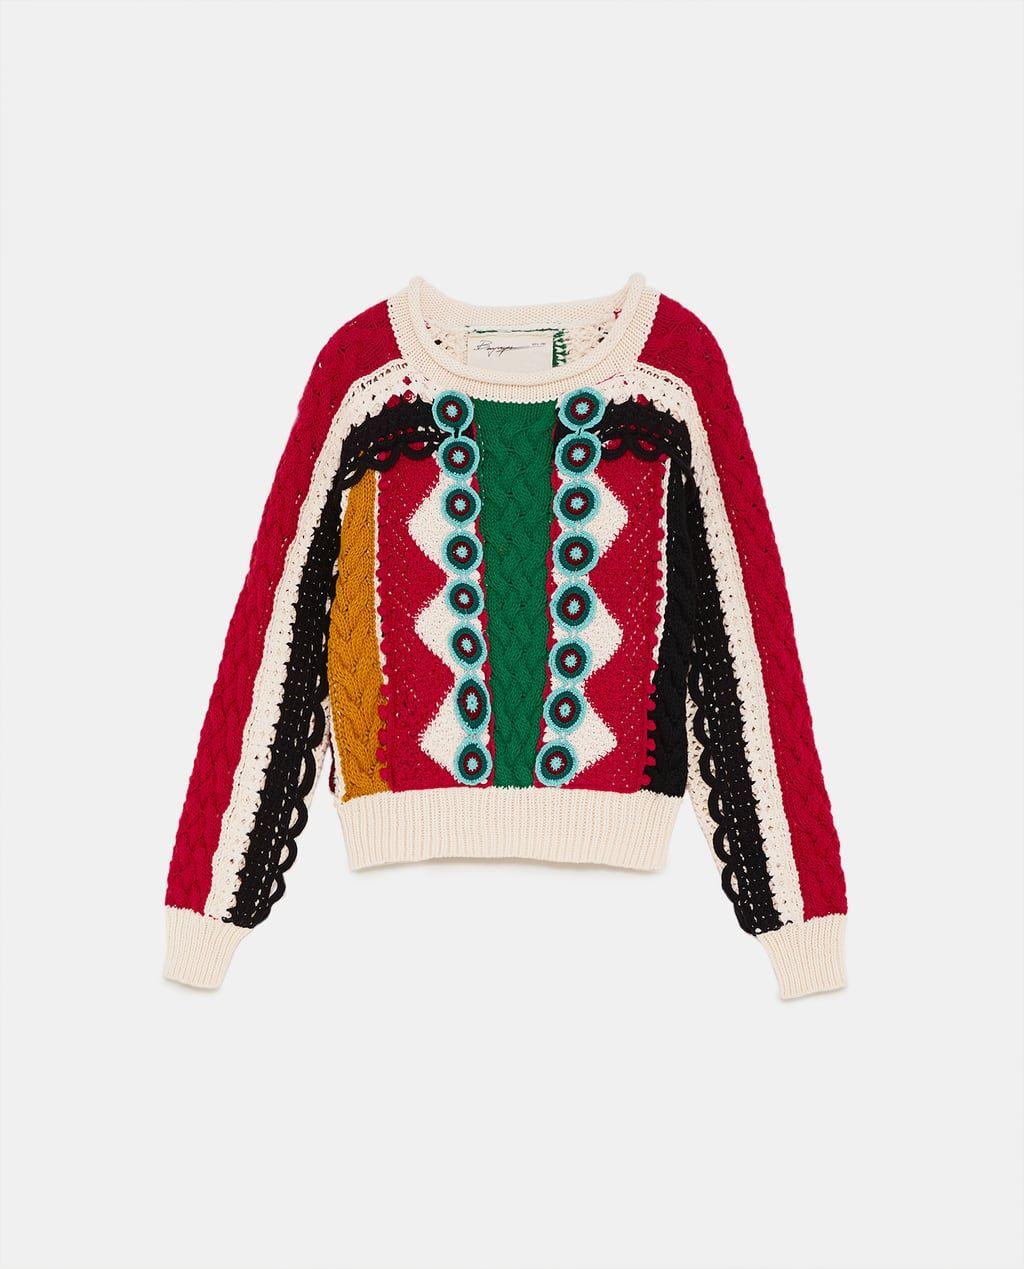 6ed56537 Limited edition zara studio fringed two-tone sweater | shopping ...